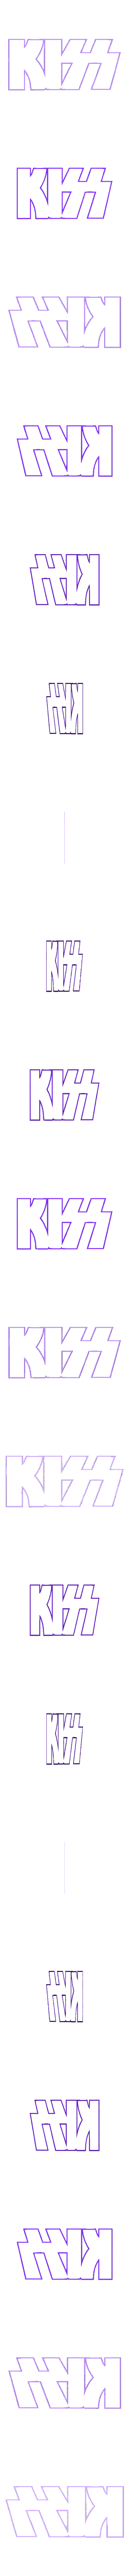 kiss_2.stl Download free STL file Logo kiss • 3D print object, 3dlito